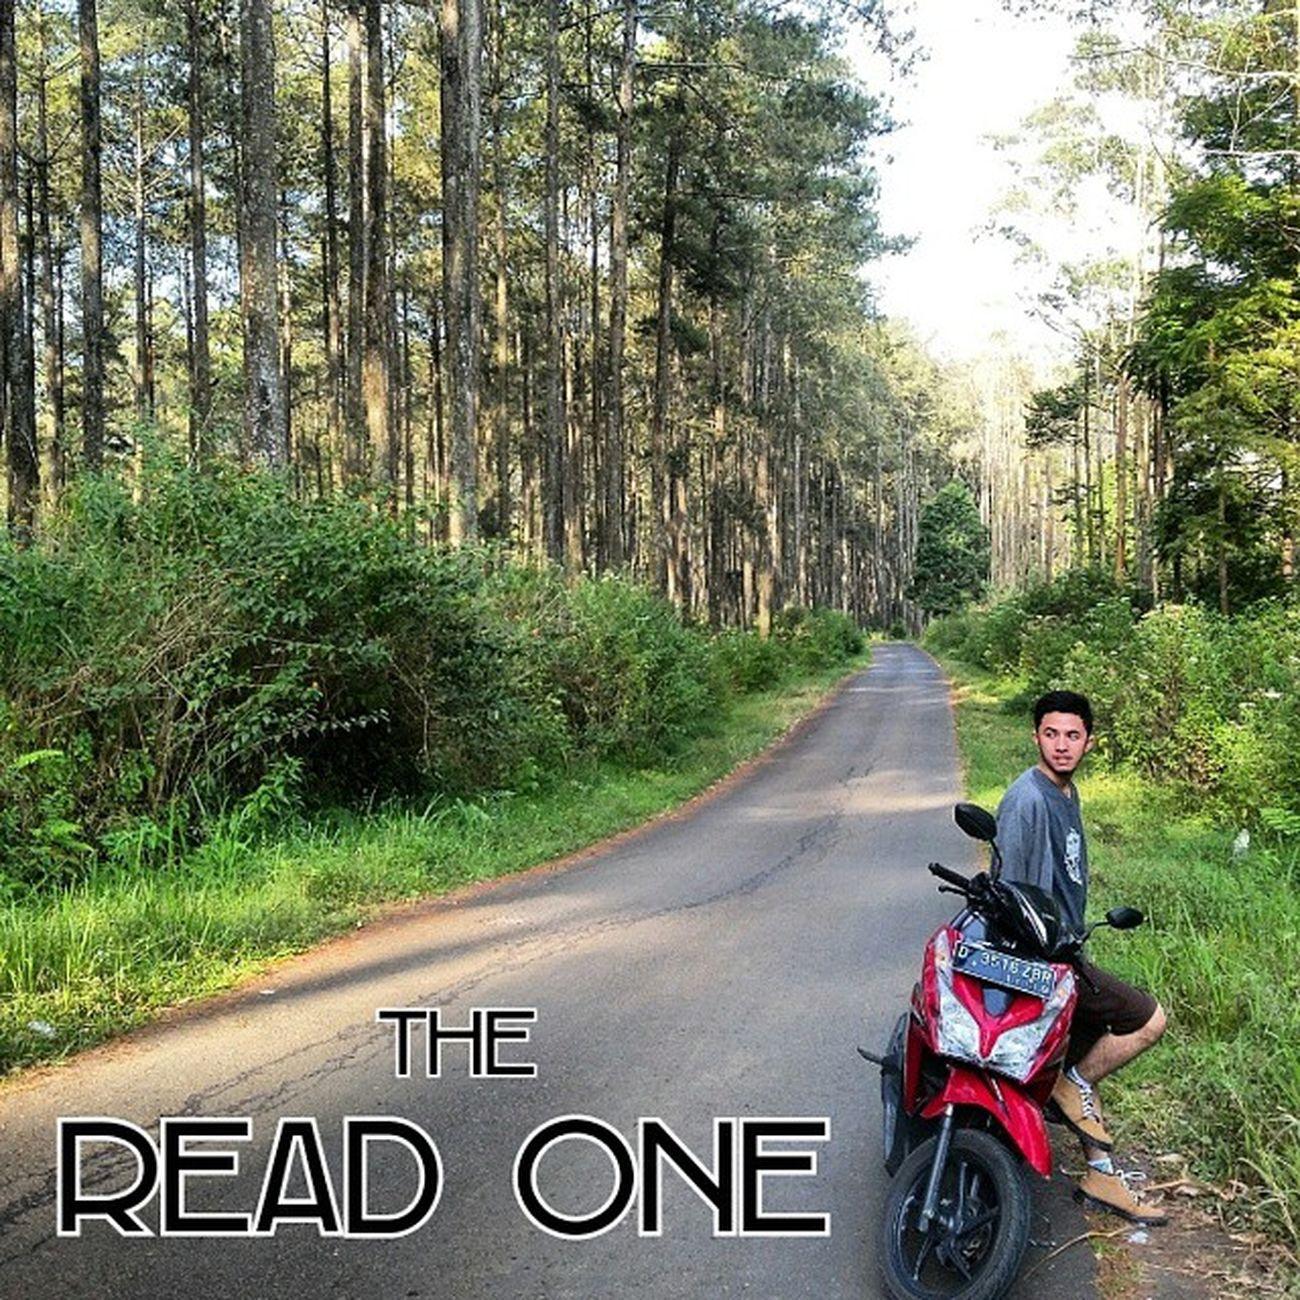 "Foto kali ini di adaptasi dari cover film TheRightOneMovie karya tangan ajaib @gandhifernando. Namanya juga ""The Read One"", jadi harus sendiri tanpa ada Tara Basro atau cewe yg menemani di fotonya.. *mepehan diri sorangan* Lokasi foto : LHI CIKOLE JAYAGIRI LEMBANG Ridwanderful JarambahBandung DiBawahLangitBandung BandungIsMe TravelingPakeReceh"